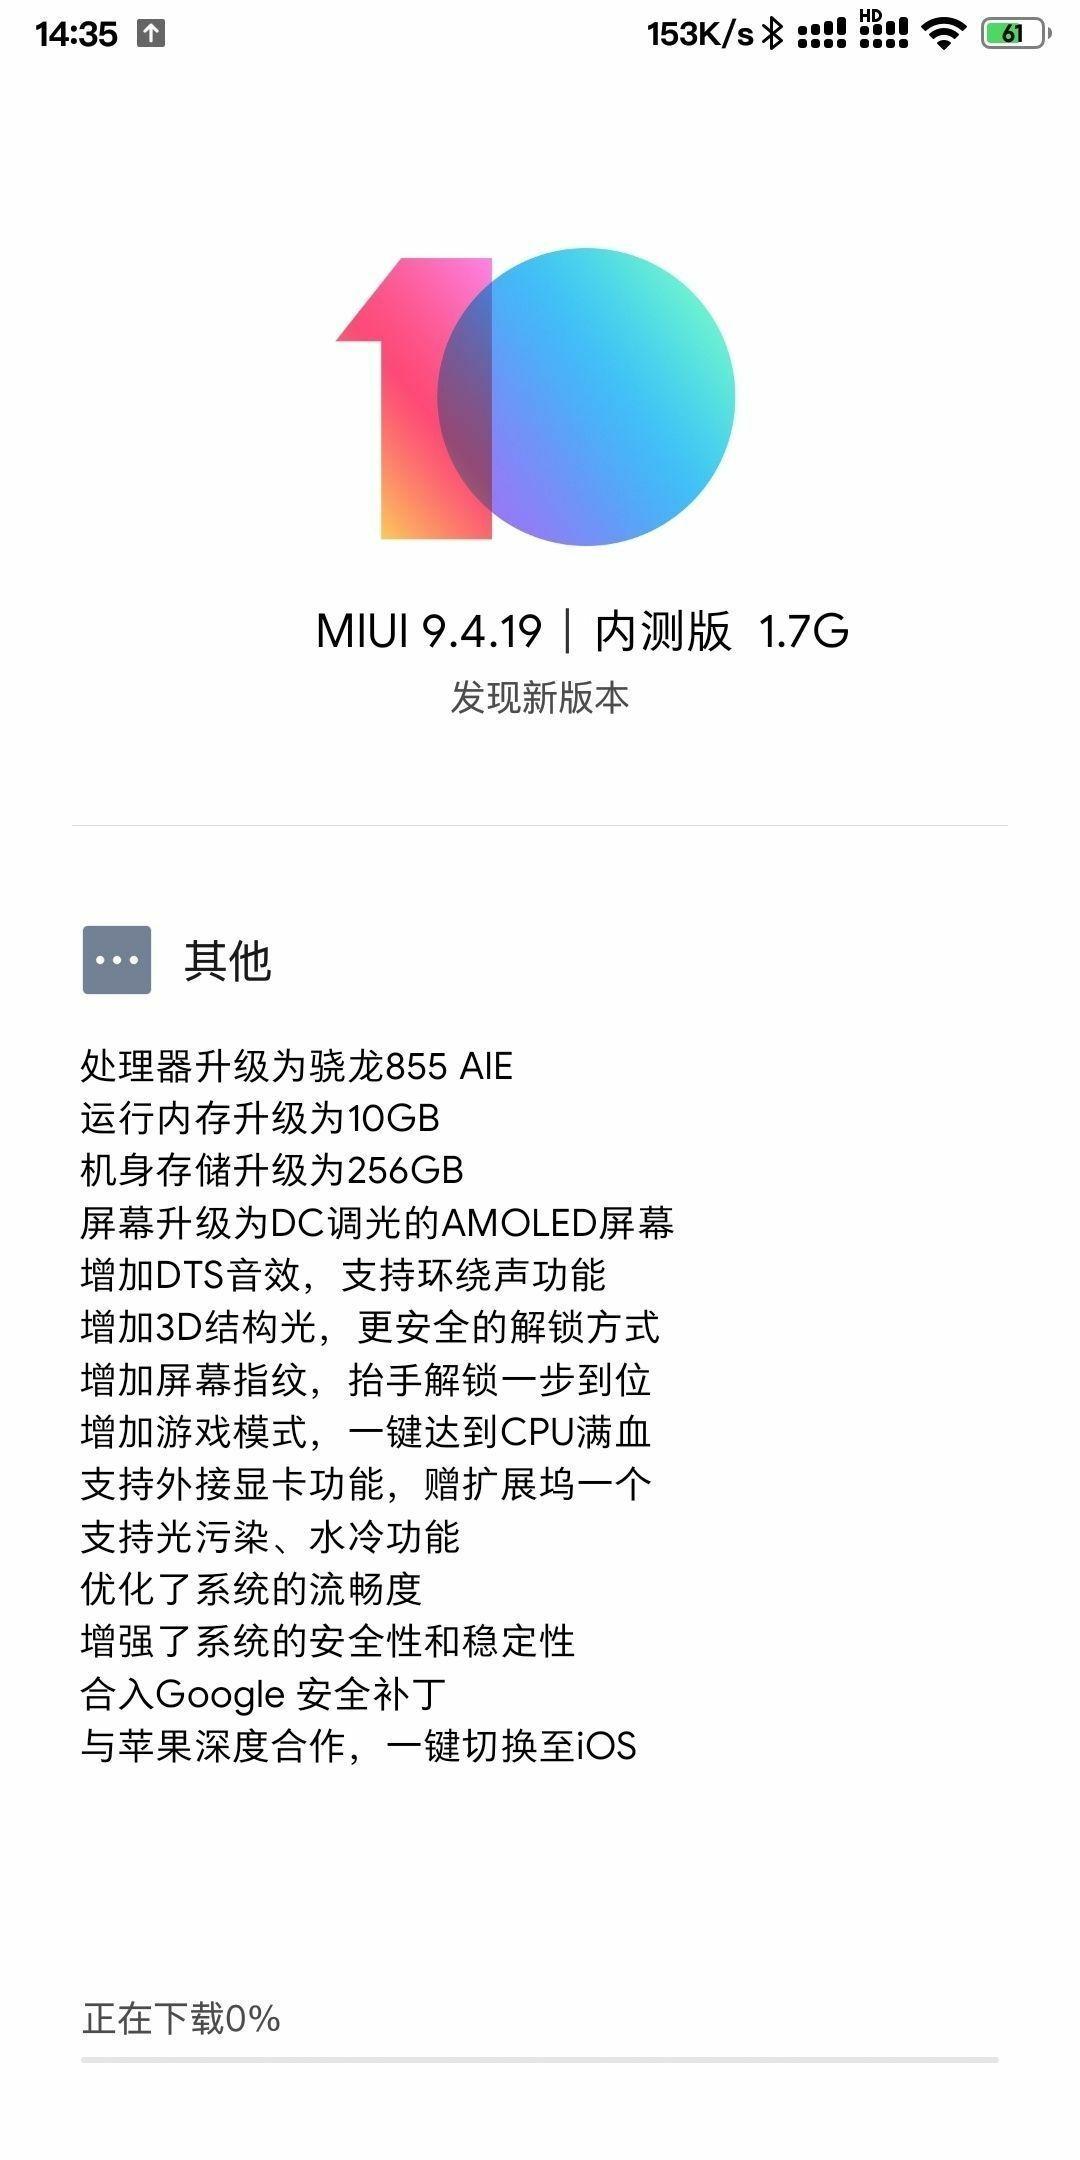 MIUI云更新硬件(图源酷安)